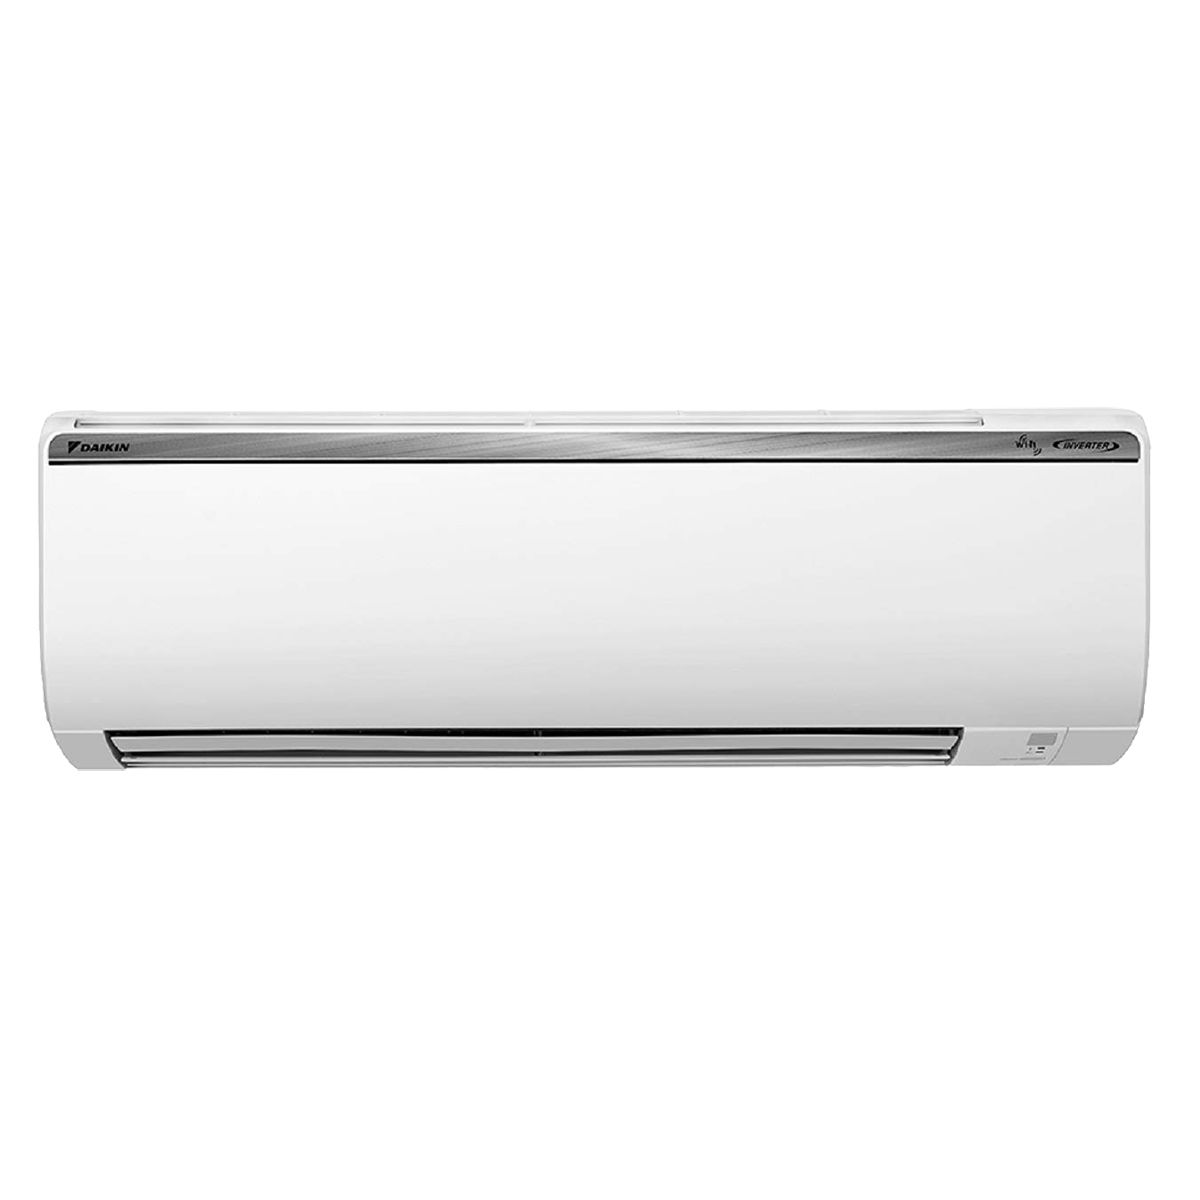 Daikin 1.5 Ton 5 Star Inverter Split AC (Wi-Fi Supported, Copper Condenser, FTKR50TV, White)_1